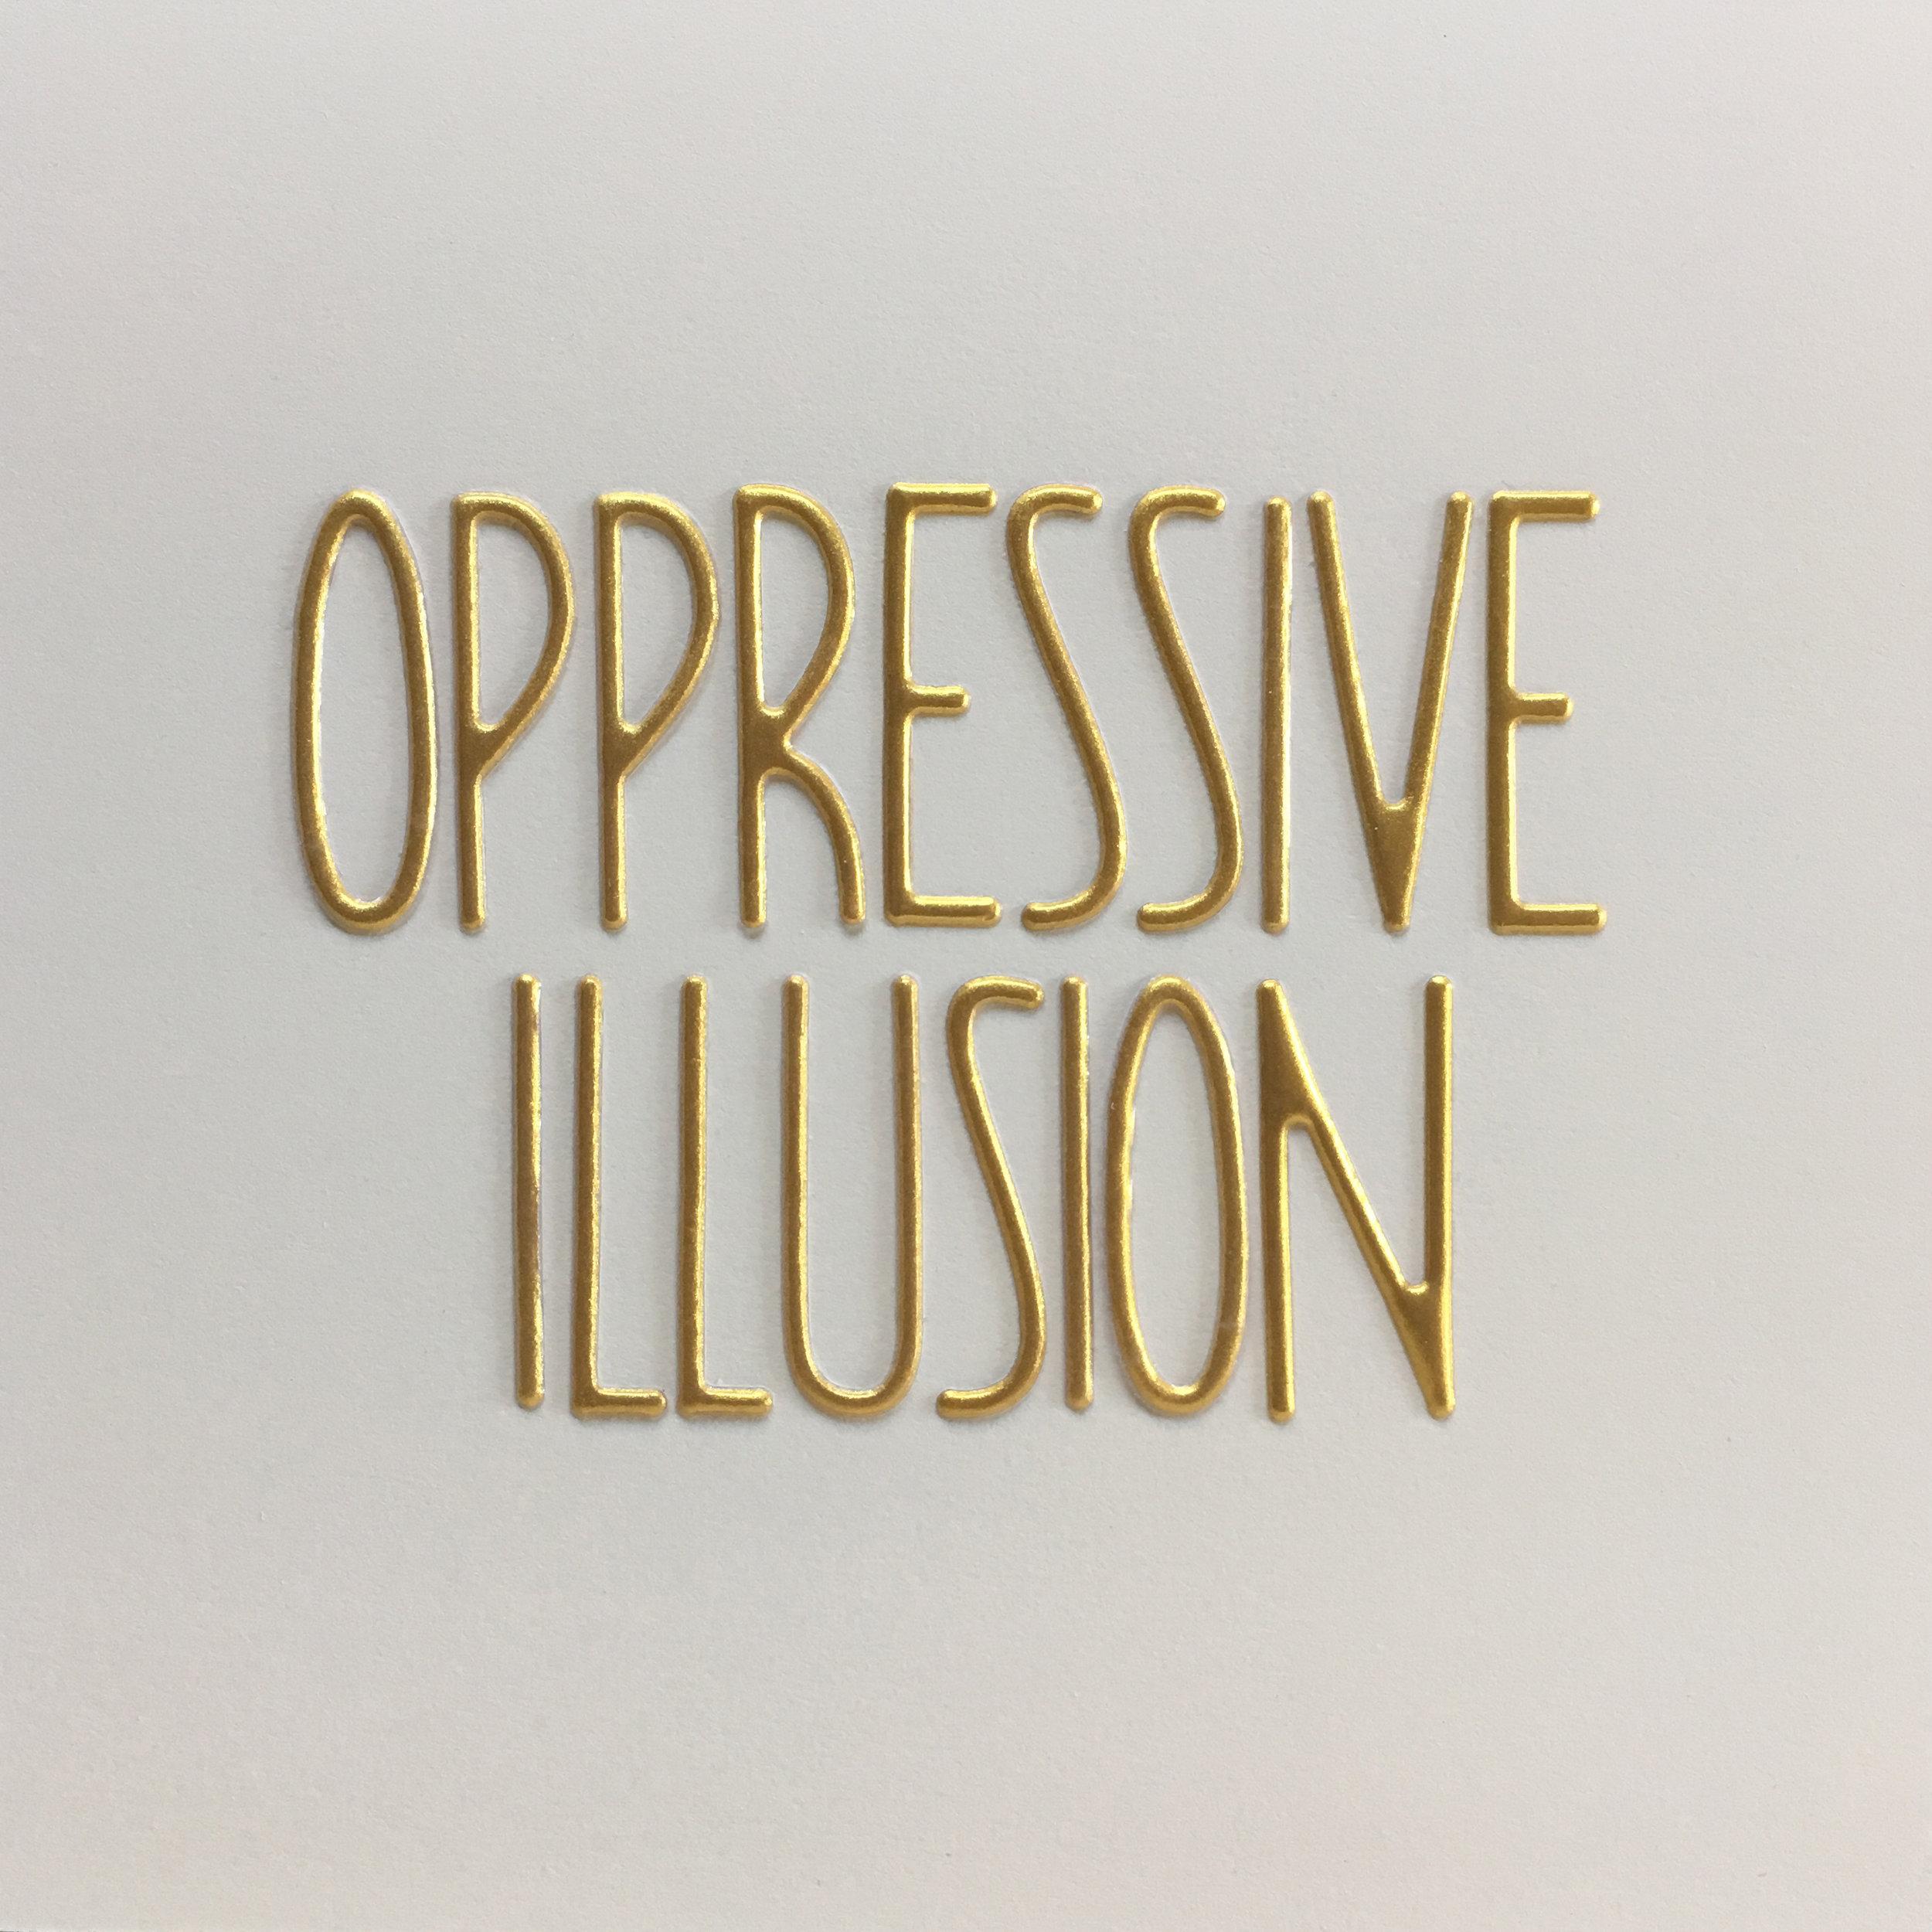 oppressive illusion.jpg